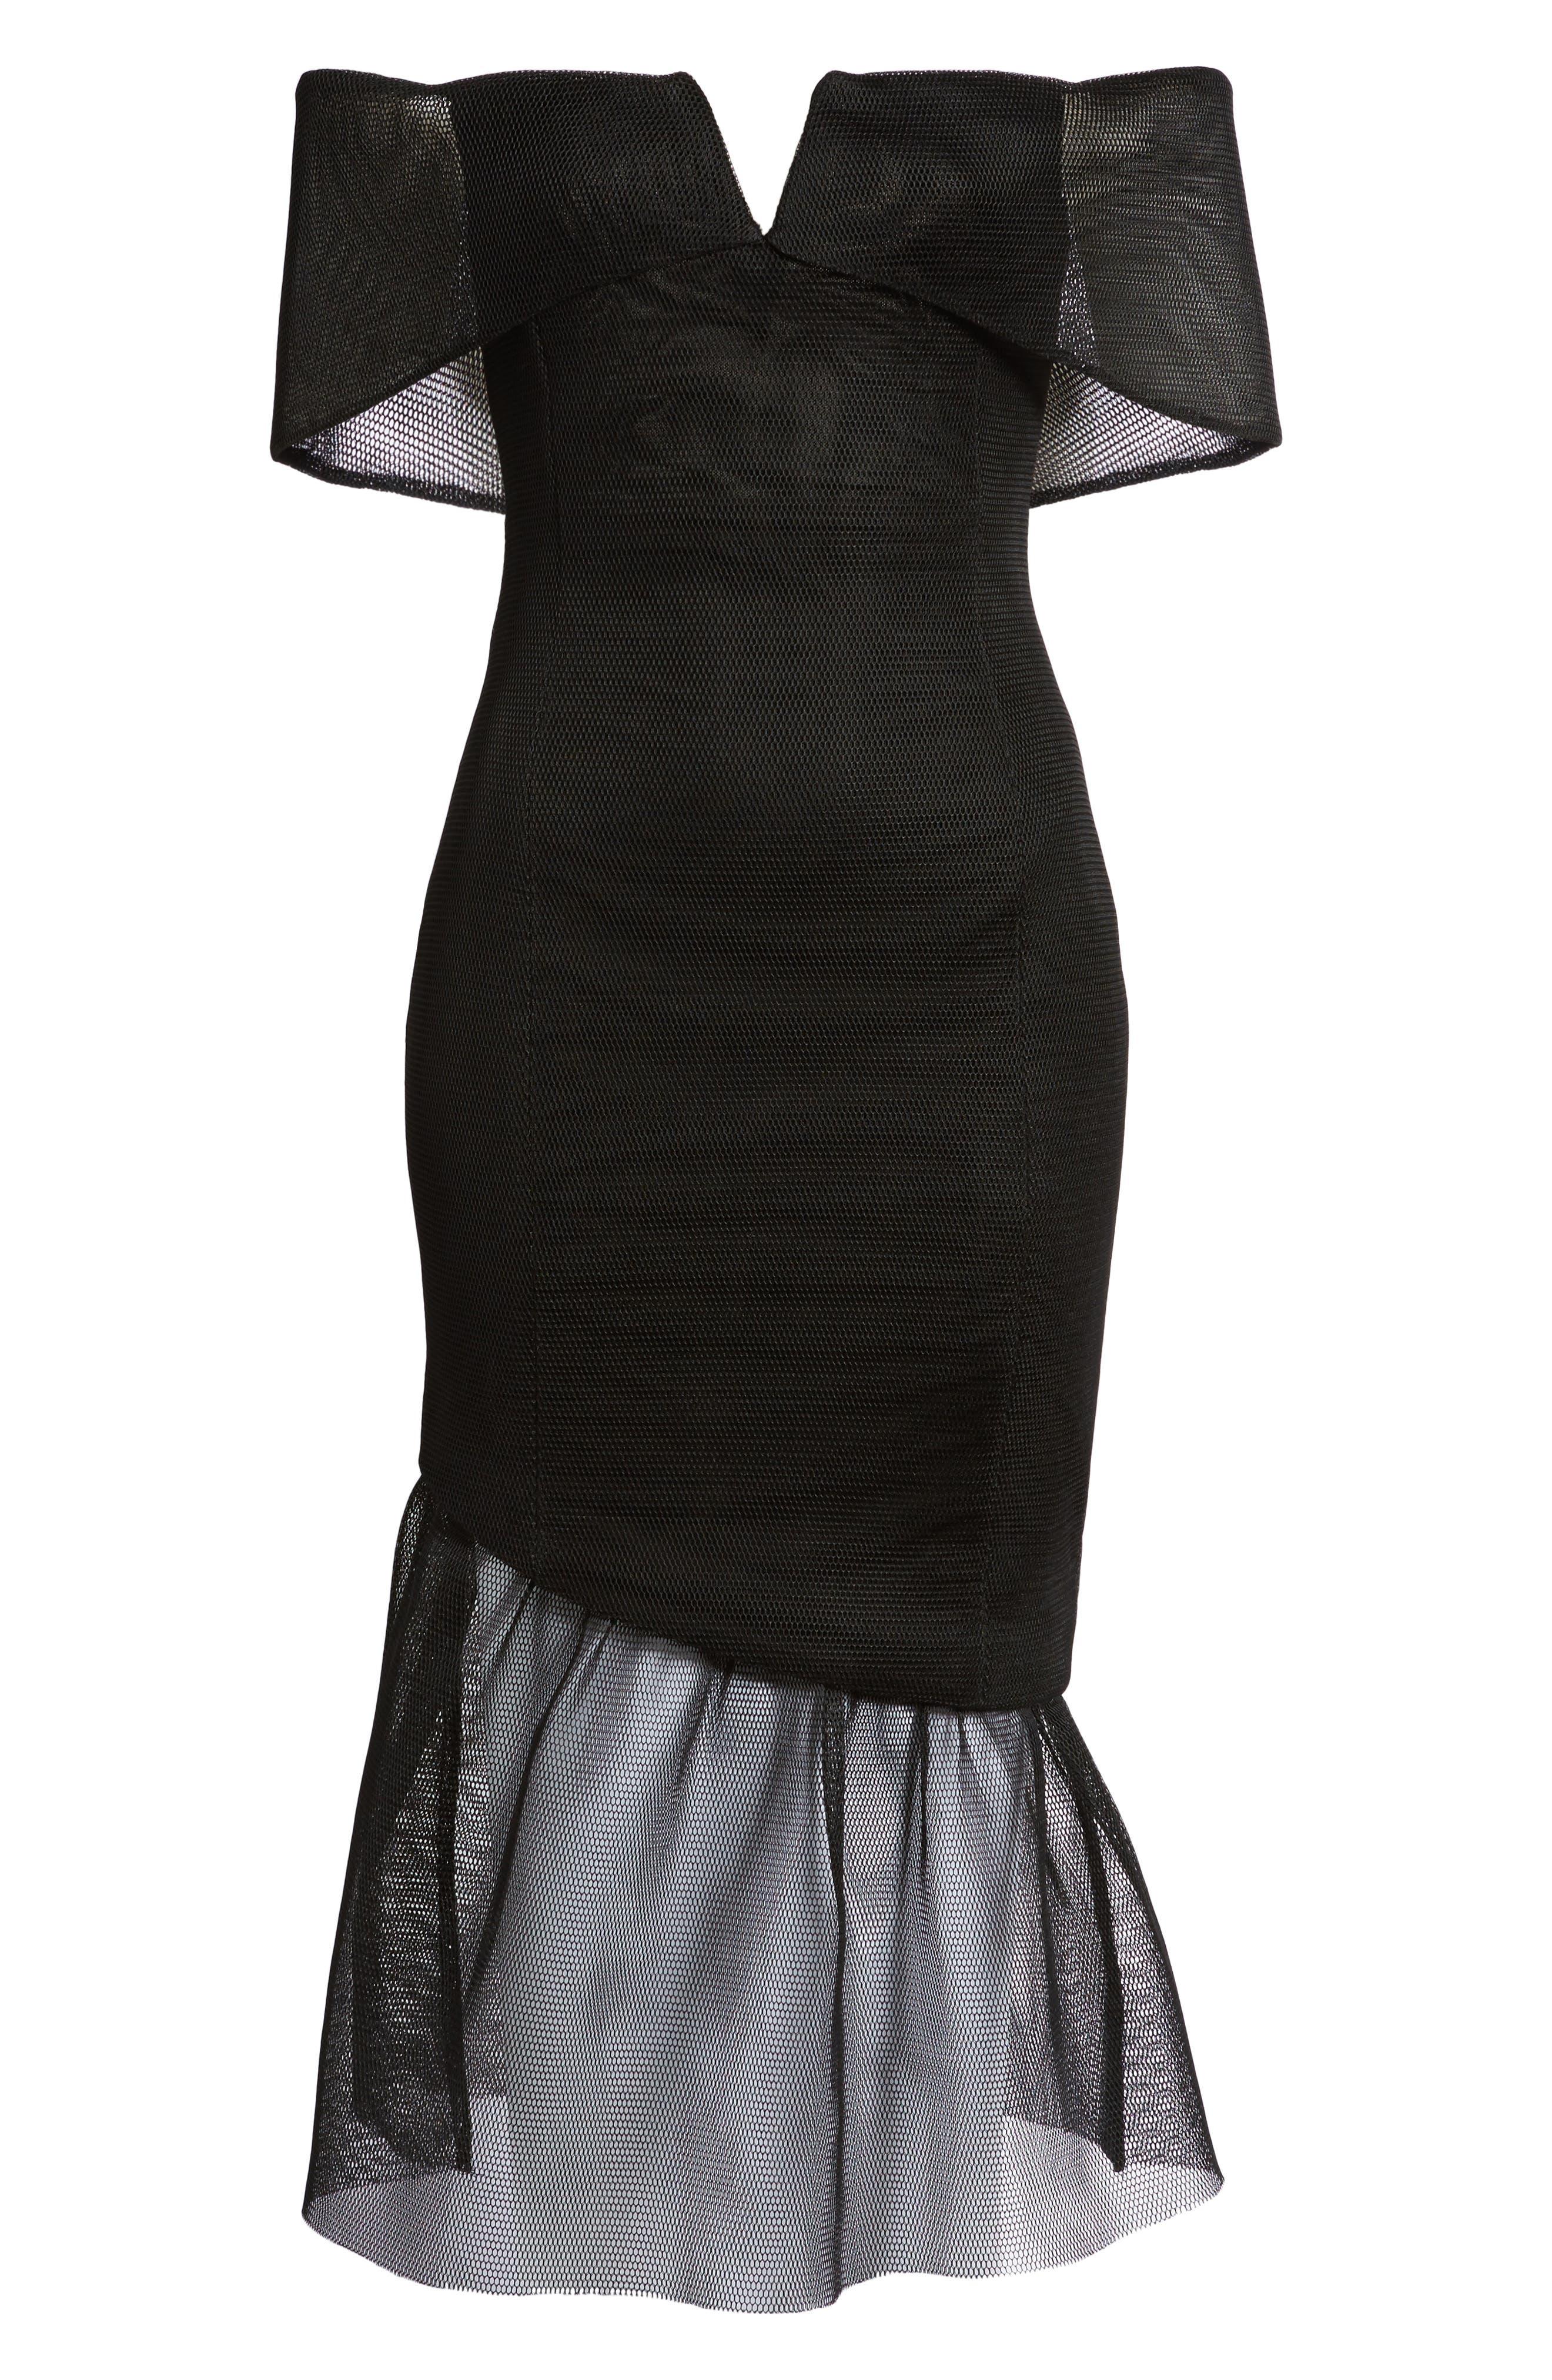 Fate Off the Shoulder Dress,                             Alternate thumbnail 6, color,                             Black